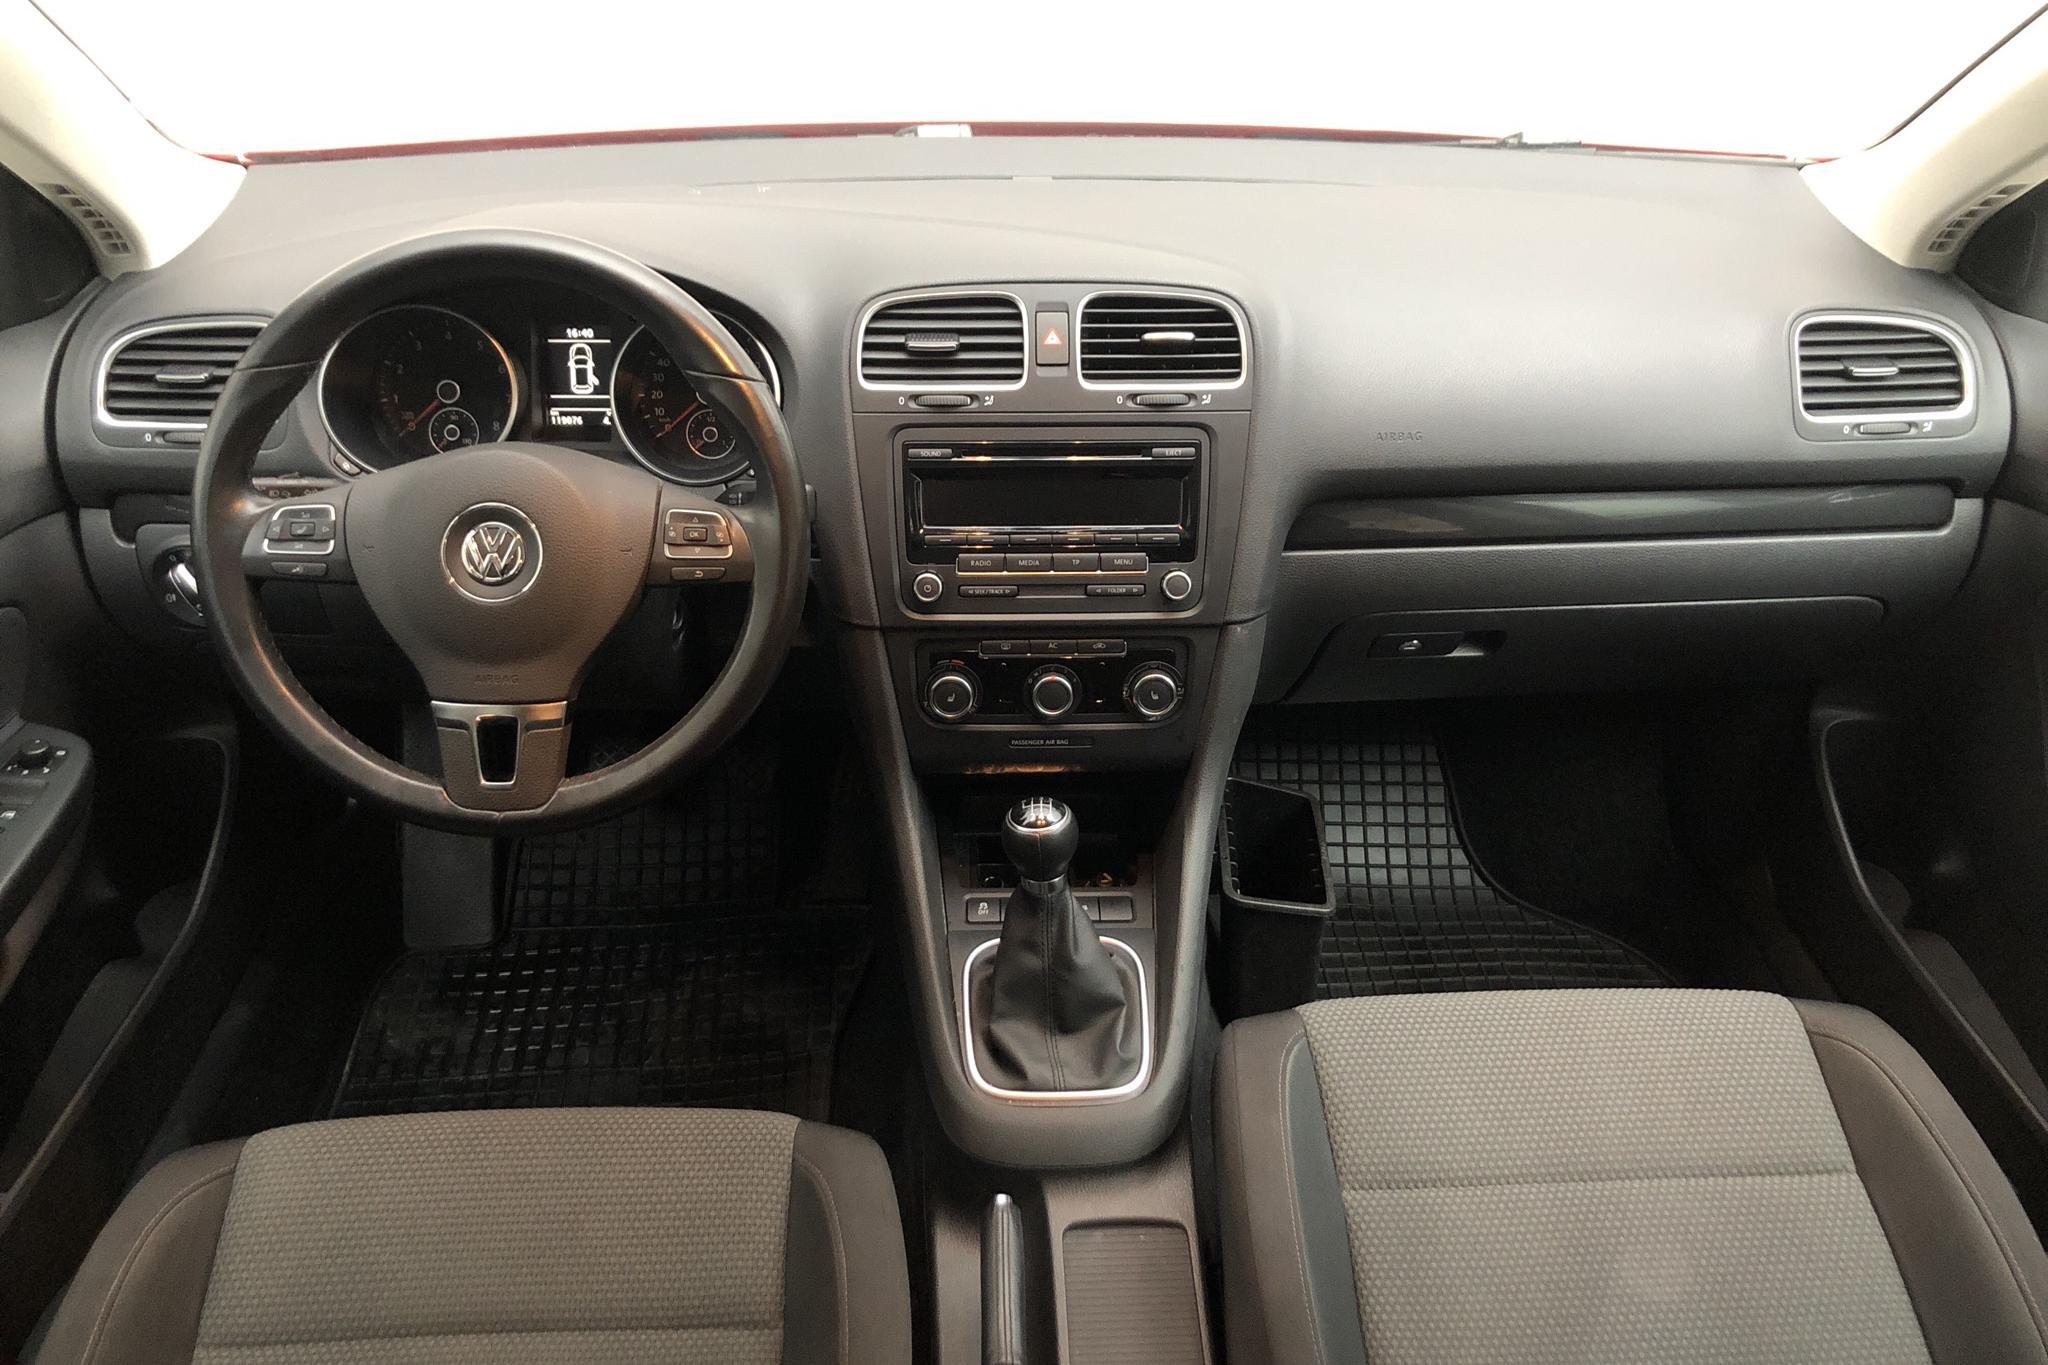 VW Golf VI 1.4 TSI Variant (122hk) - 11 907 mil - Manuell - röd - 2012